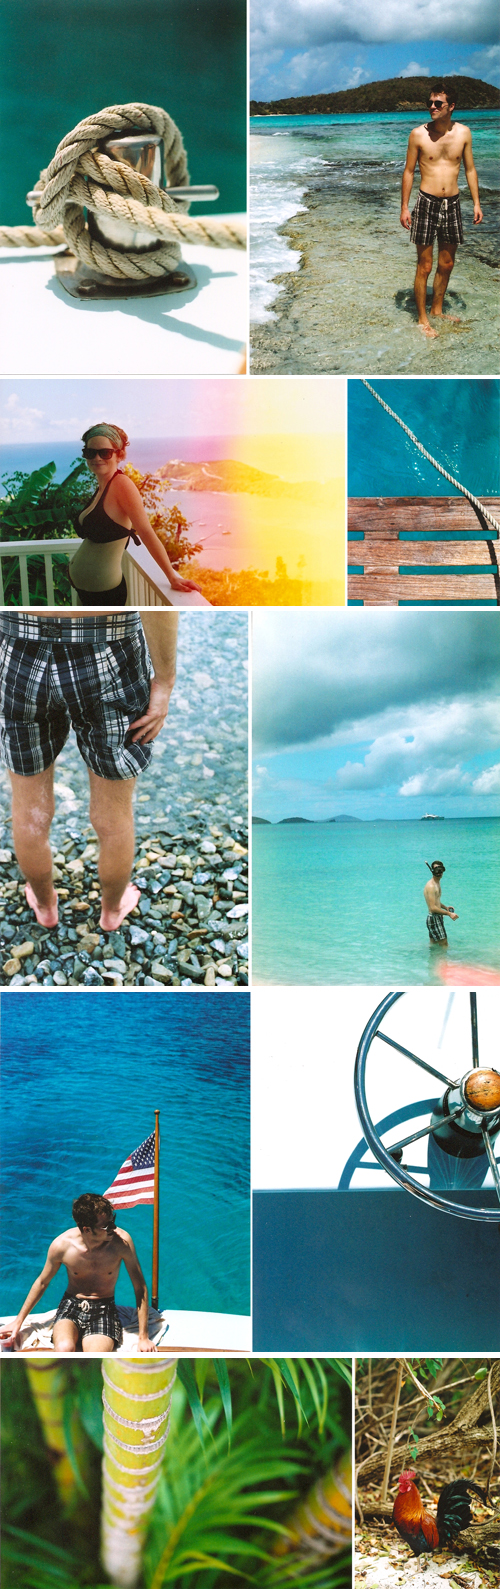 ST_JOHN_United State Virgin Islands